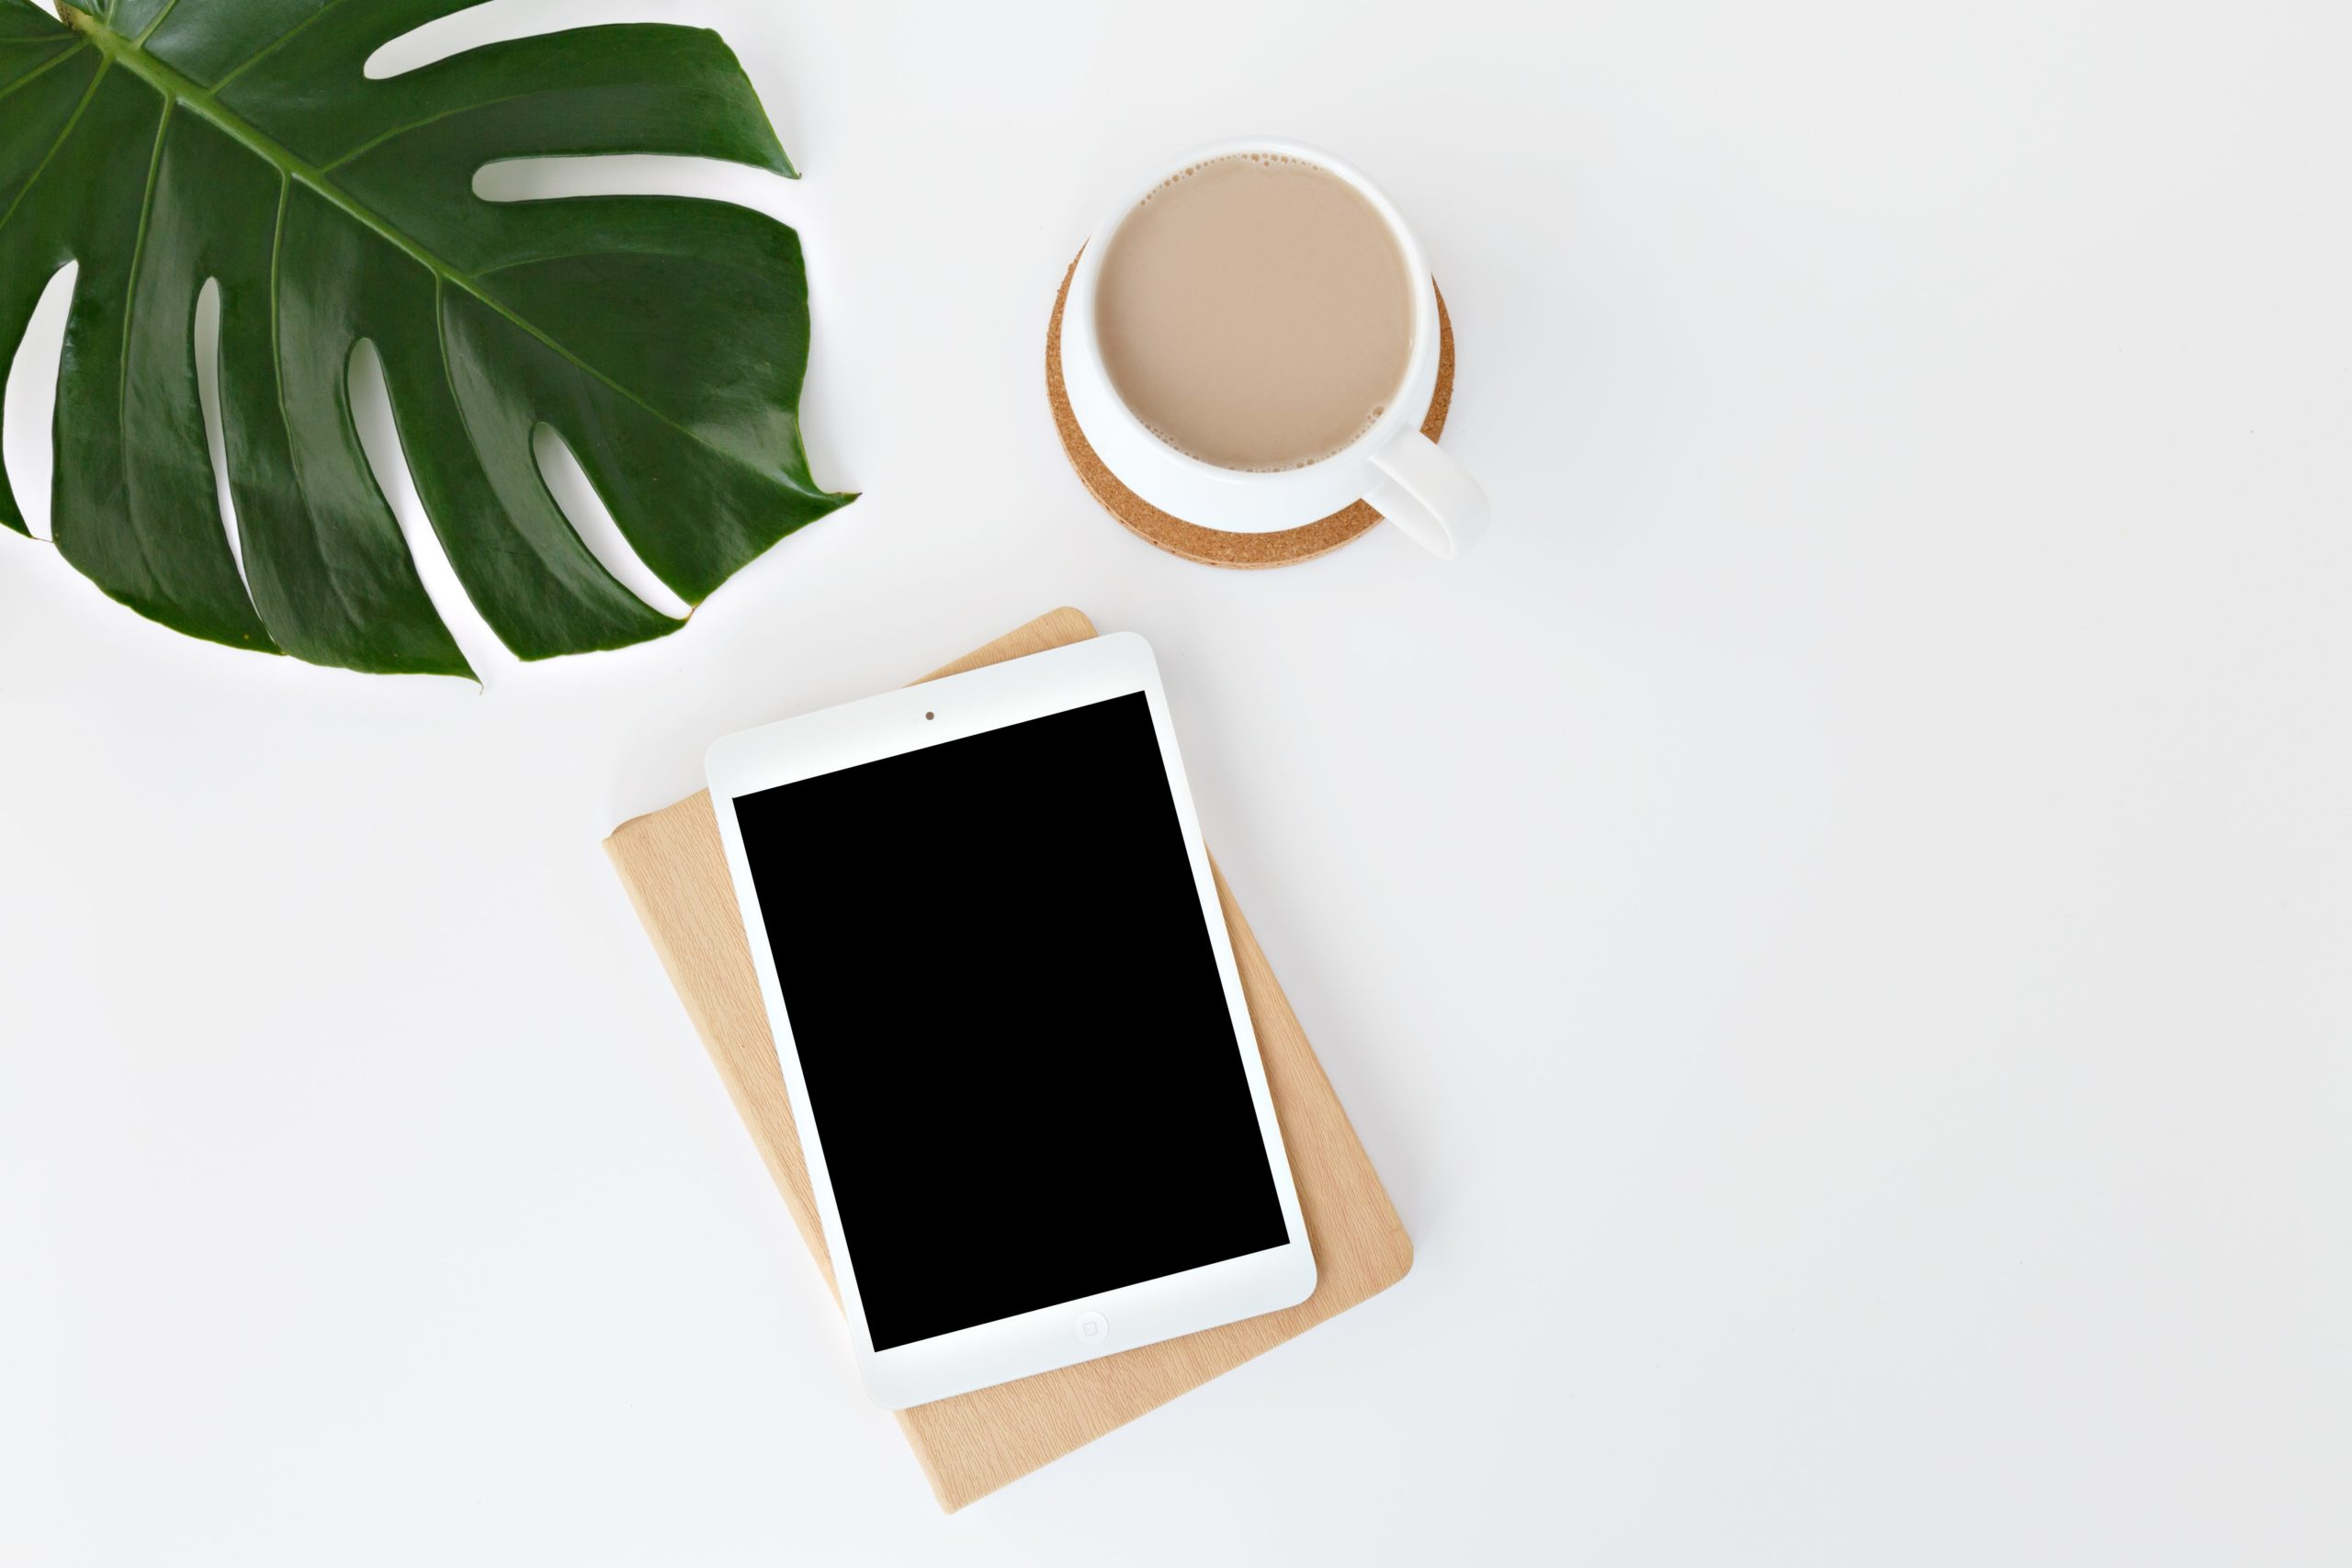 【iPadヘビーユーザー伝授】勉強・情報収集に使えるおすすめアプリ